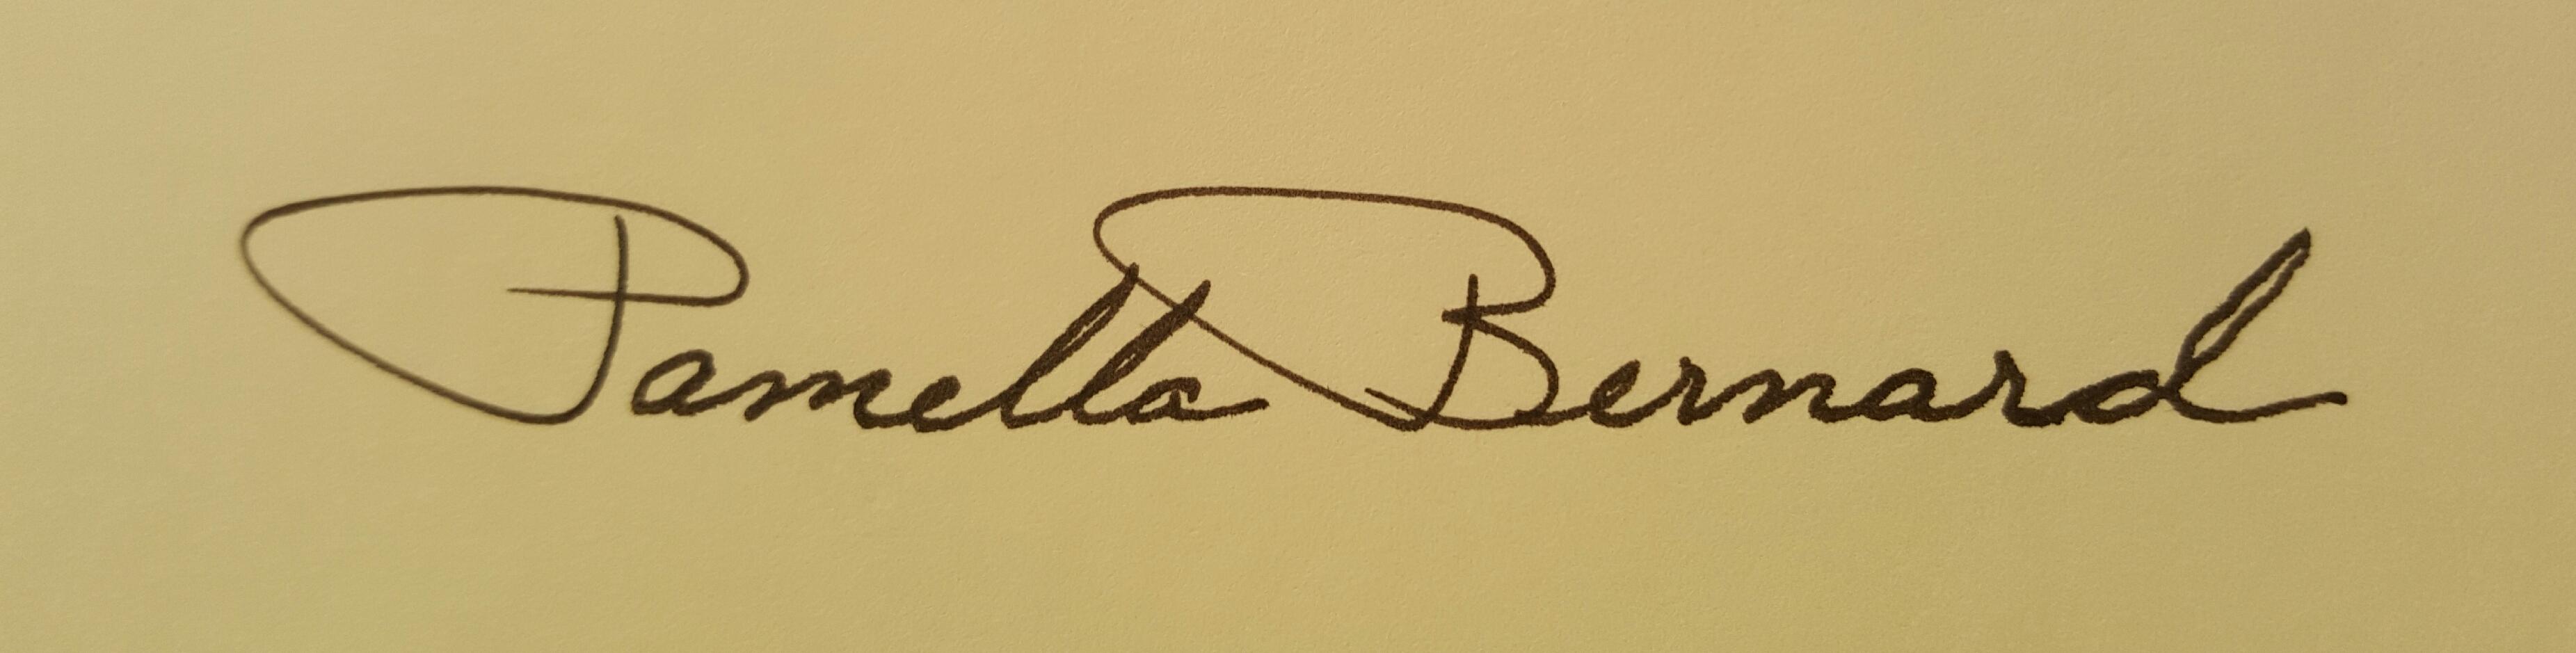 Pamella Bernard Signature